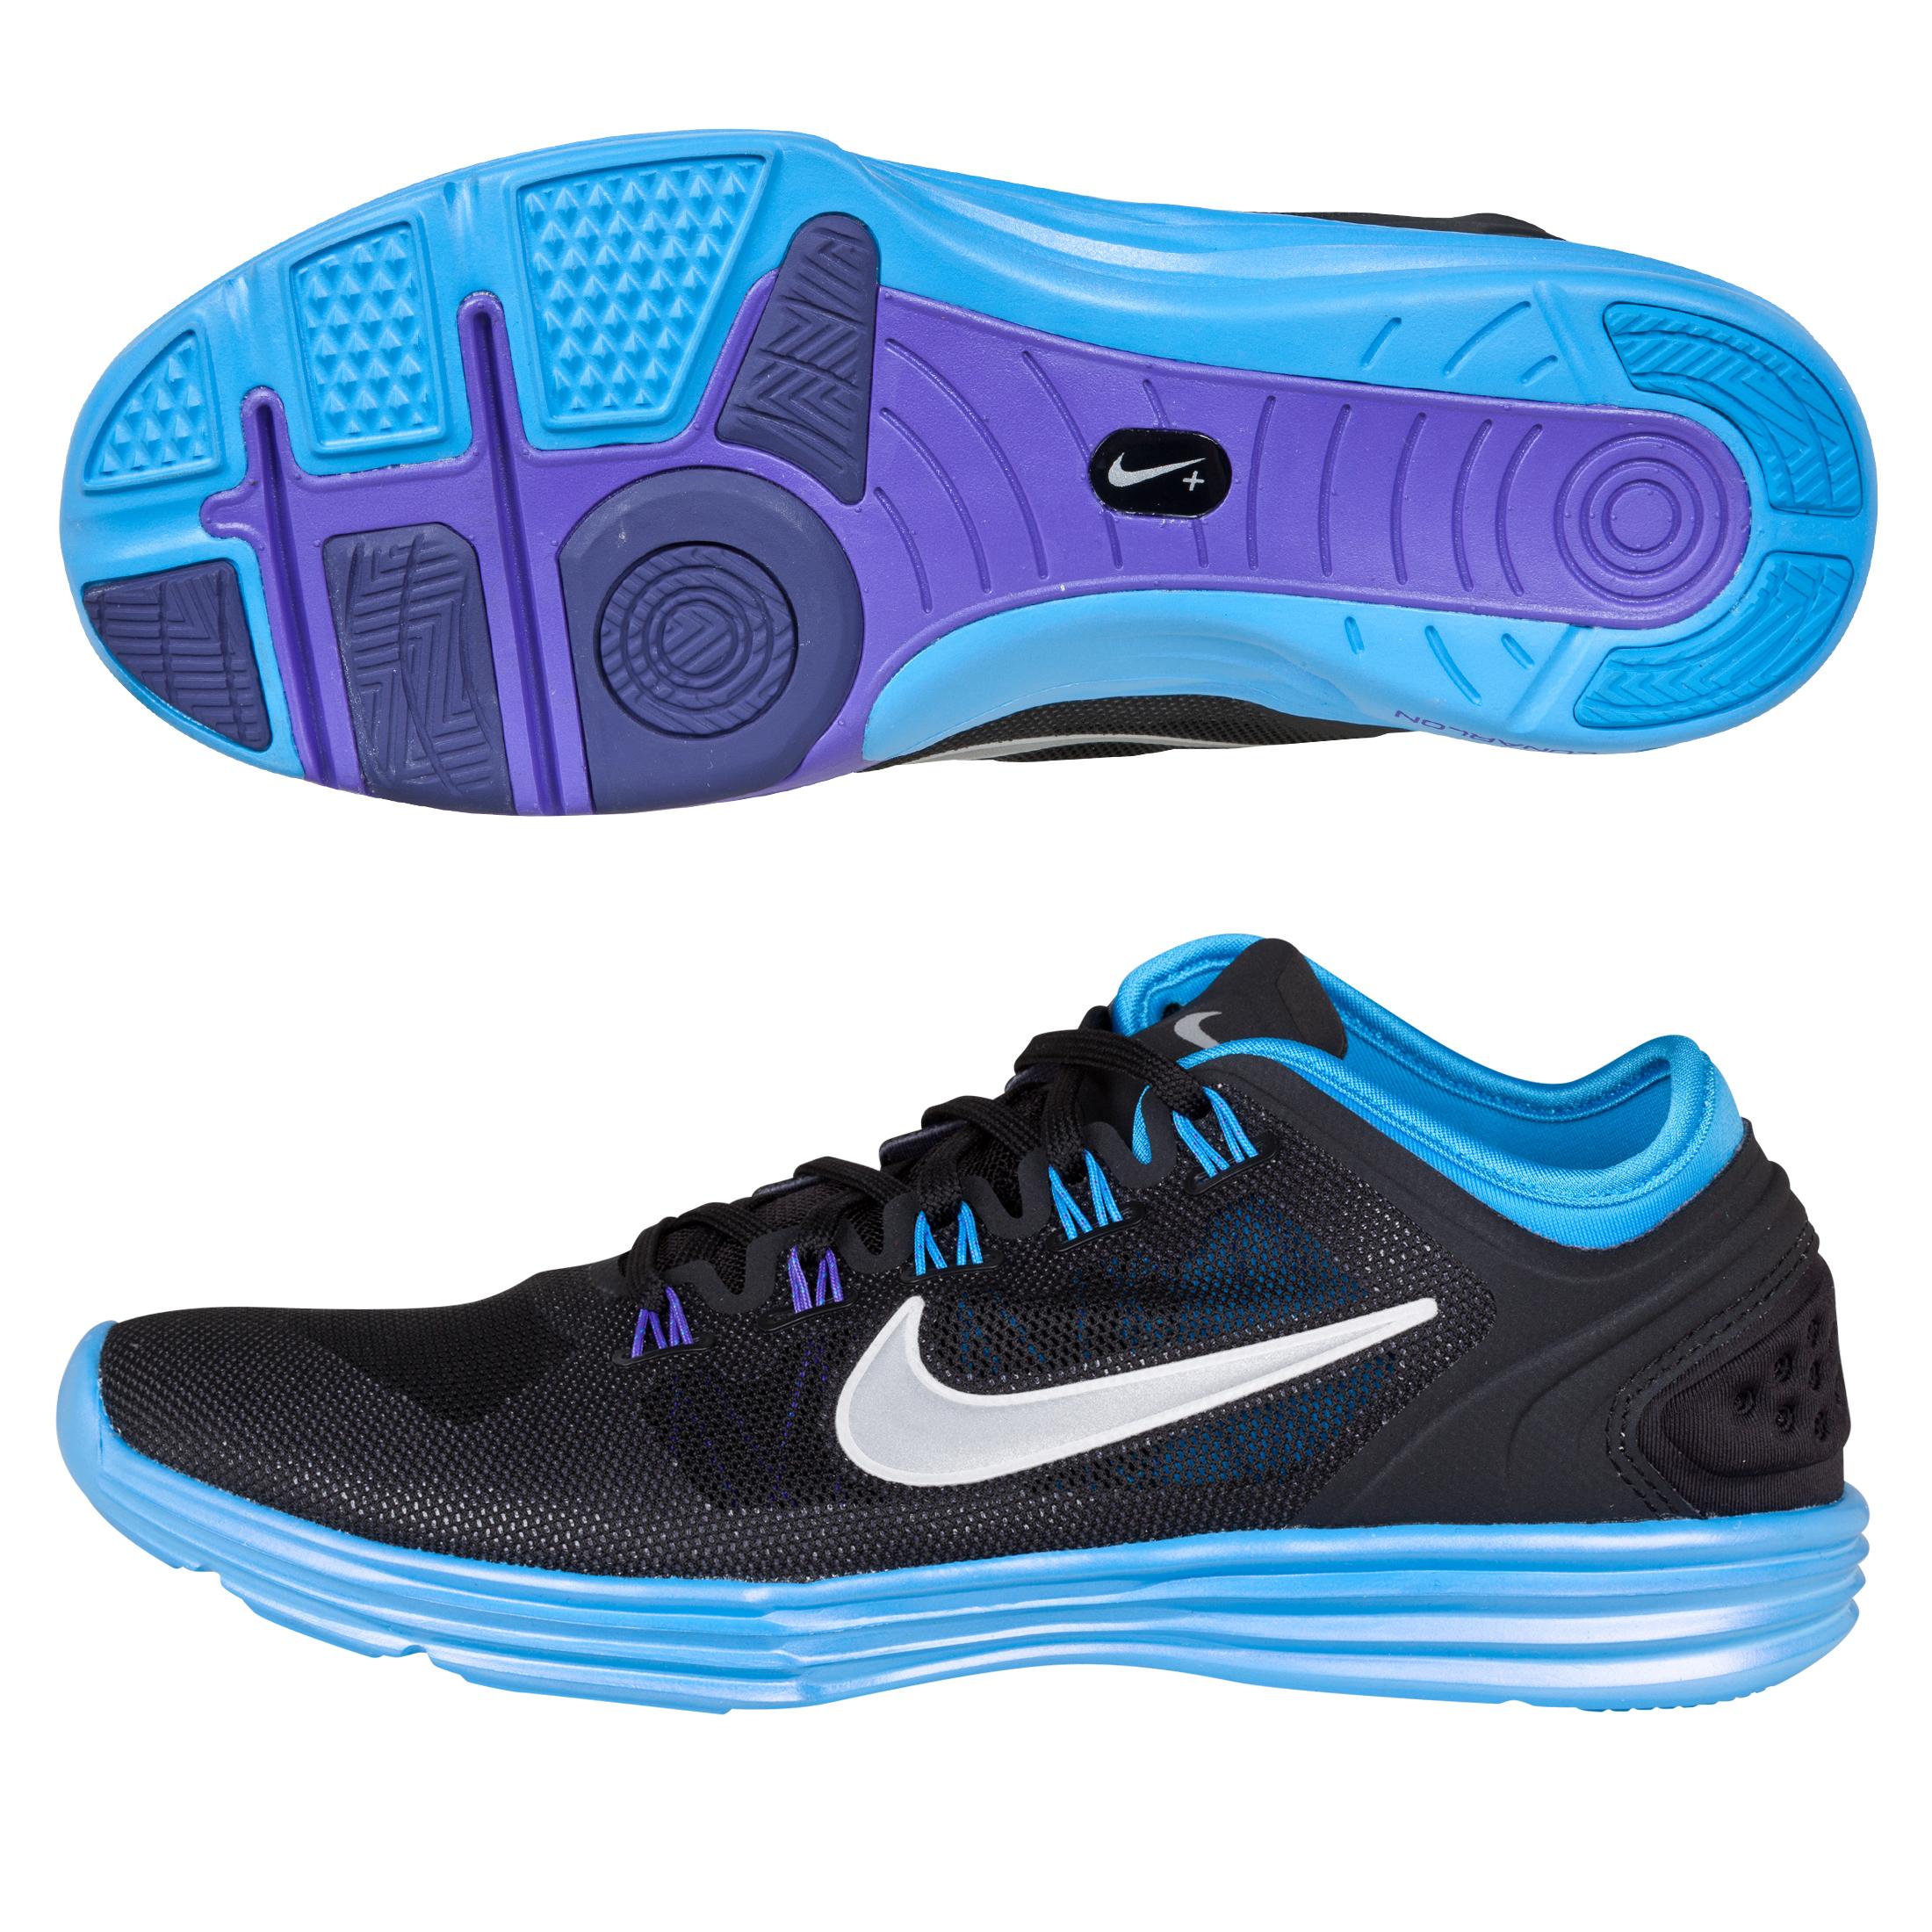 Nike Lunarhyperworkout - Black/Silver/Blue - Womens